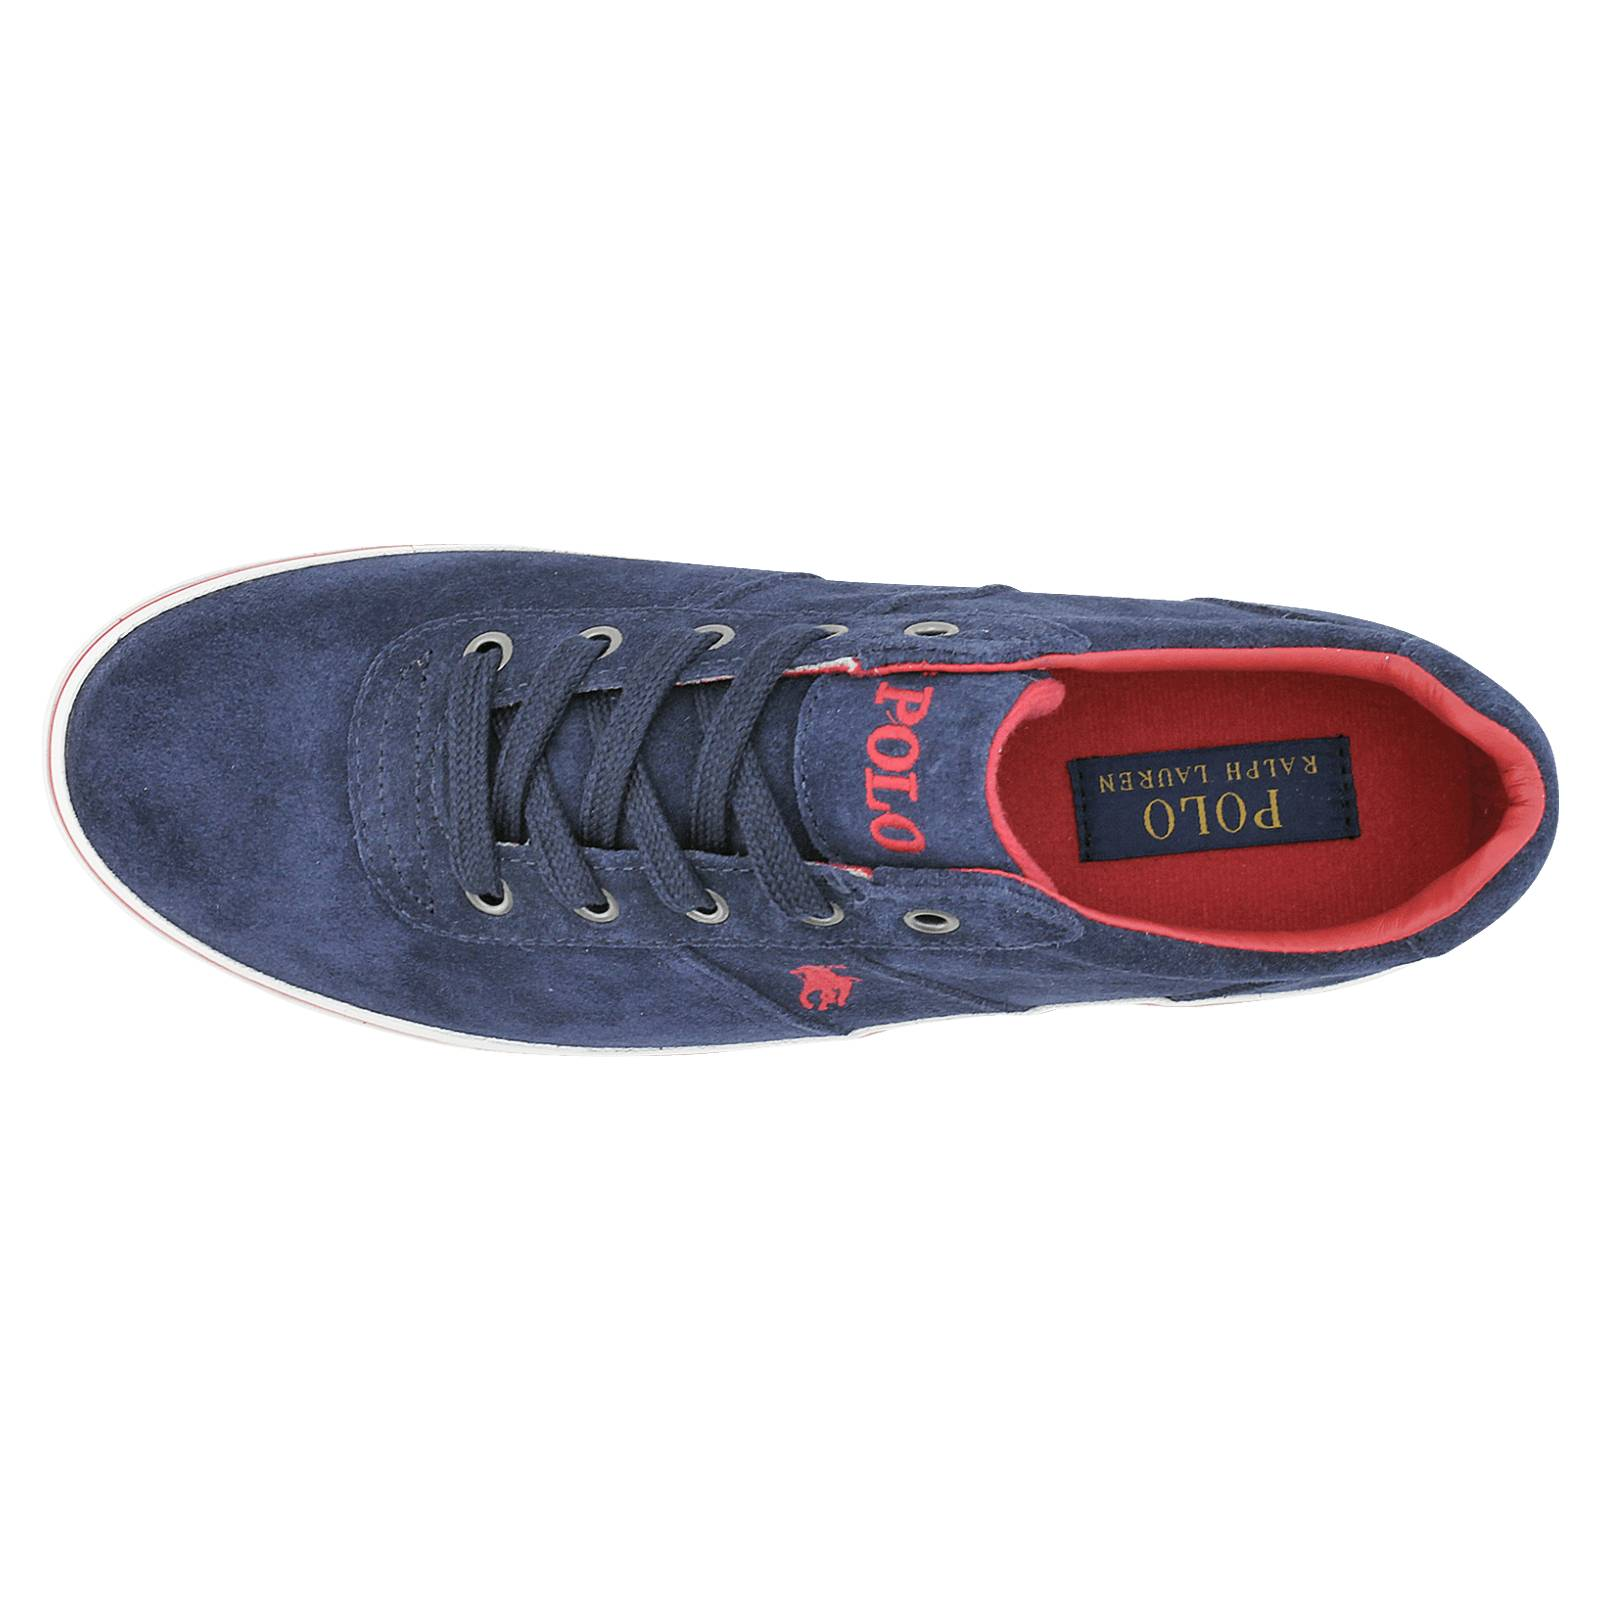 Ralph Casual Polo Lauren Shoes Sneakers Hanford Vulc yb6Yfgv7